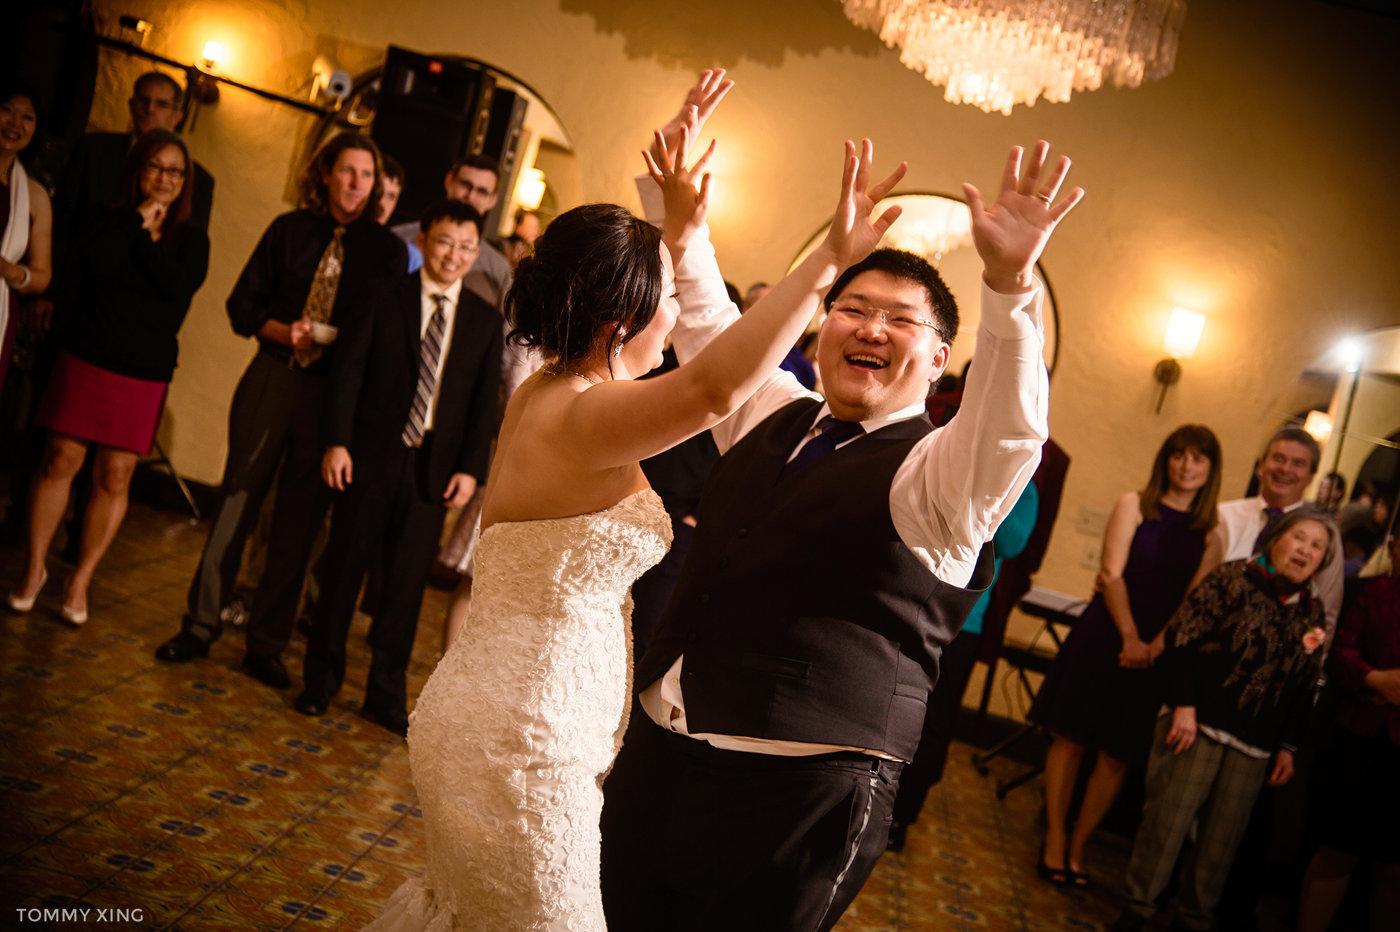 STANFORD MEMORIAL CHURCH WEDDING - Wenjie & Chengcheng - SAN FRANCISCO BAY AREA 斯坦福教堂婚礼跟拍 - 洛杉矶婚礼婚纱照摄影师 Tommy Xing Photography255.jpg